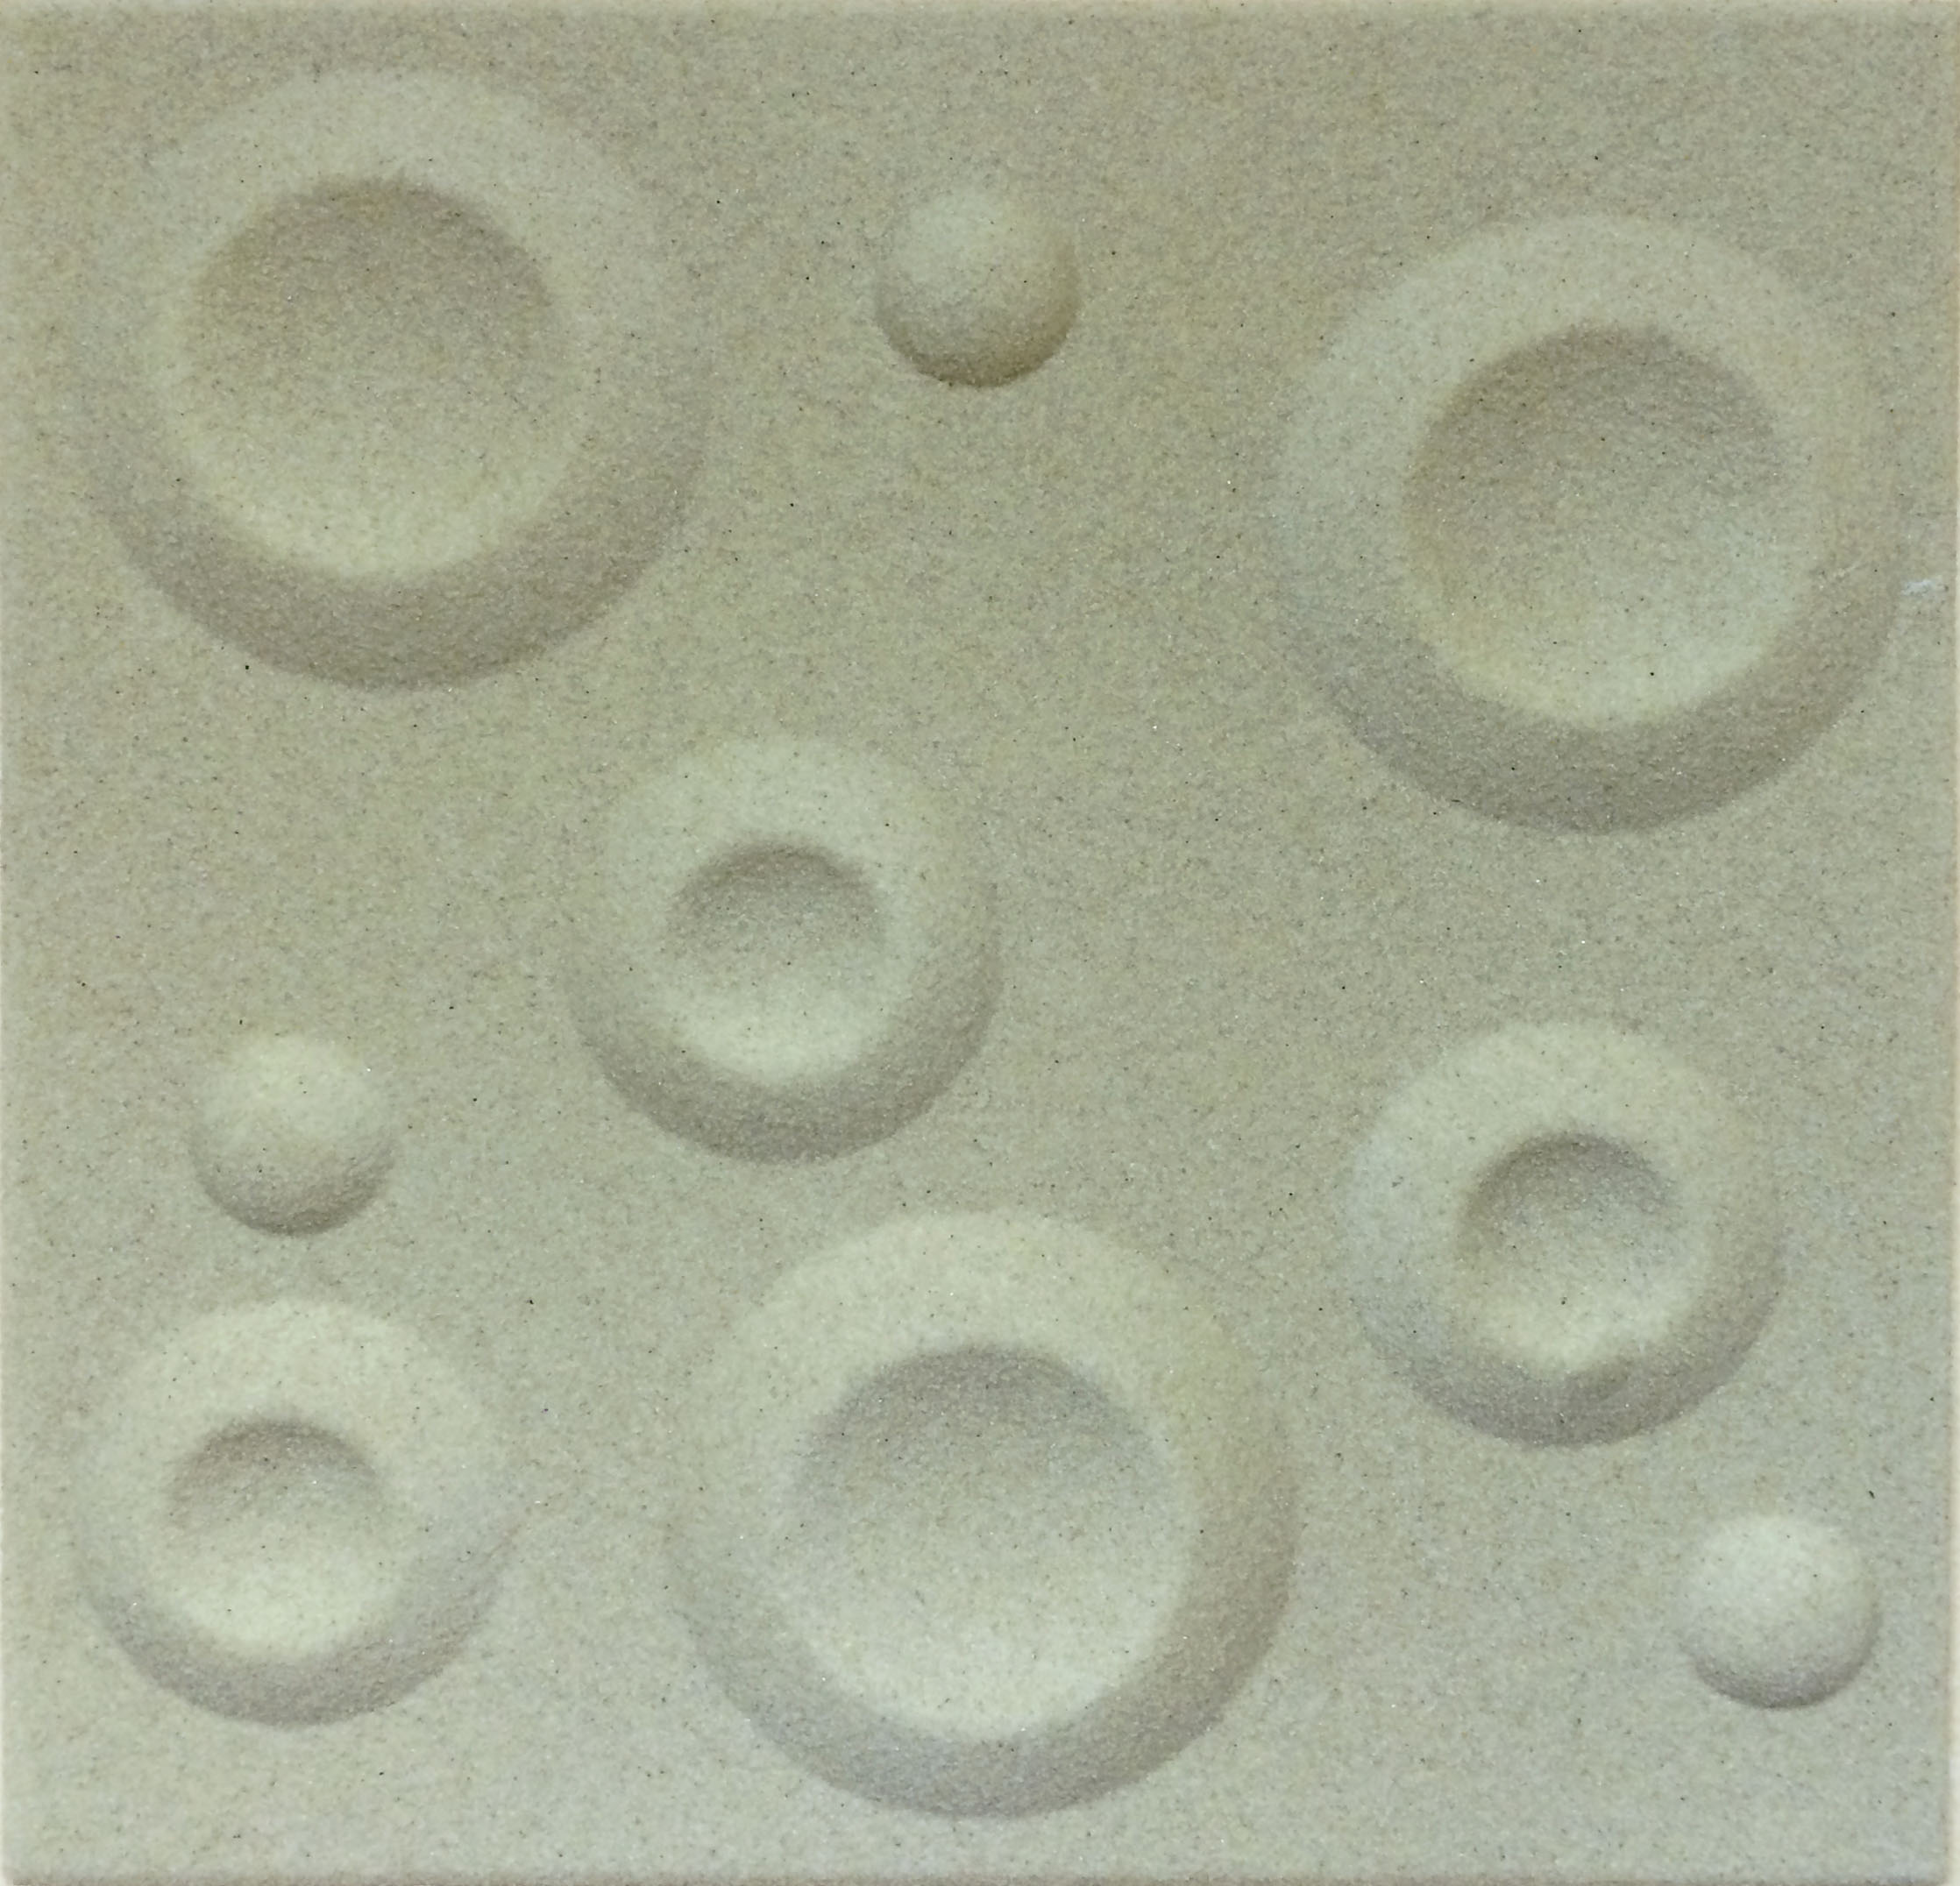 Crater panels sand texture 4pc antique ceilings glue up crater panels sand texture 4pc antique ceilings glue up ceiling tiles and drop in grid ceiling tiles antique ceilings dailygadgetfo Choice Image